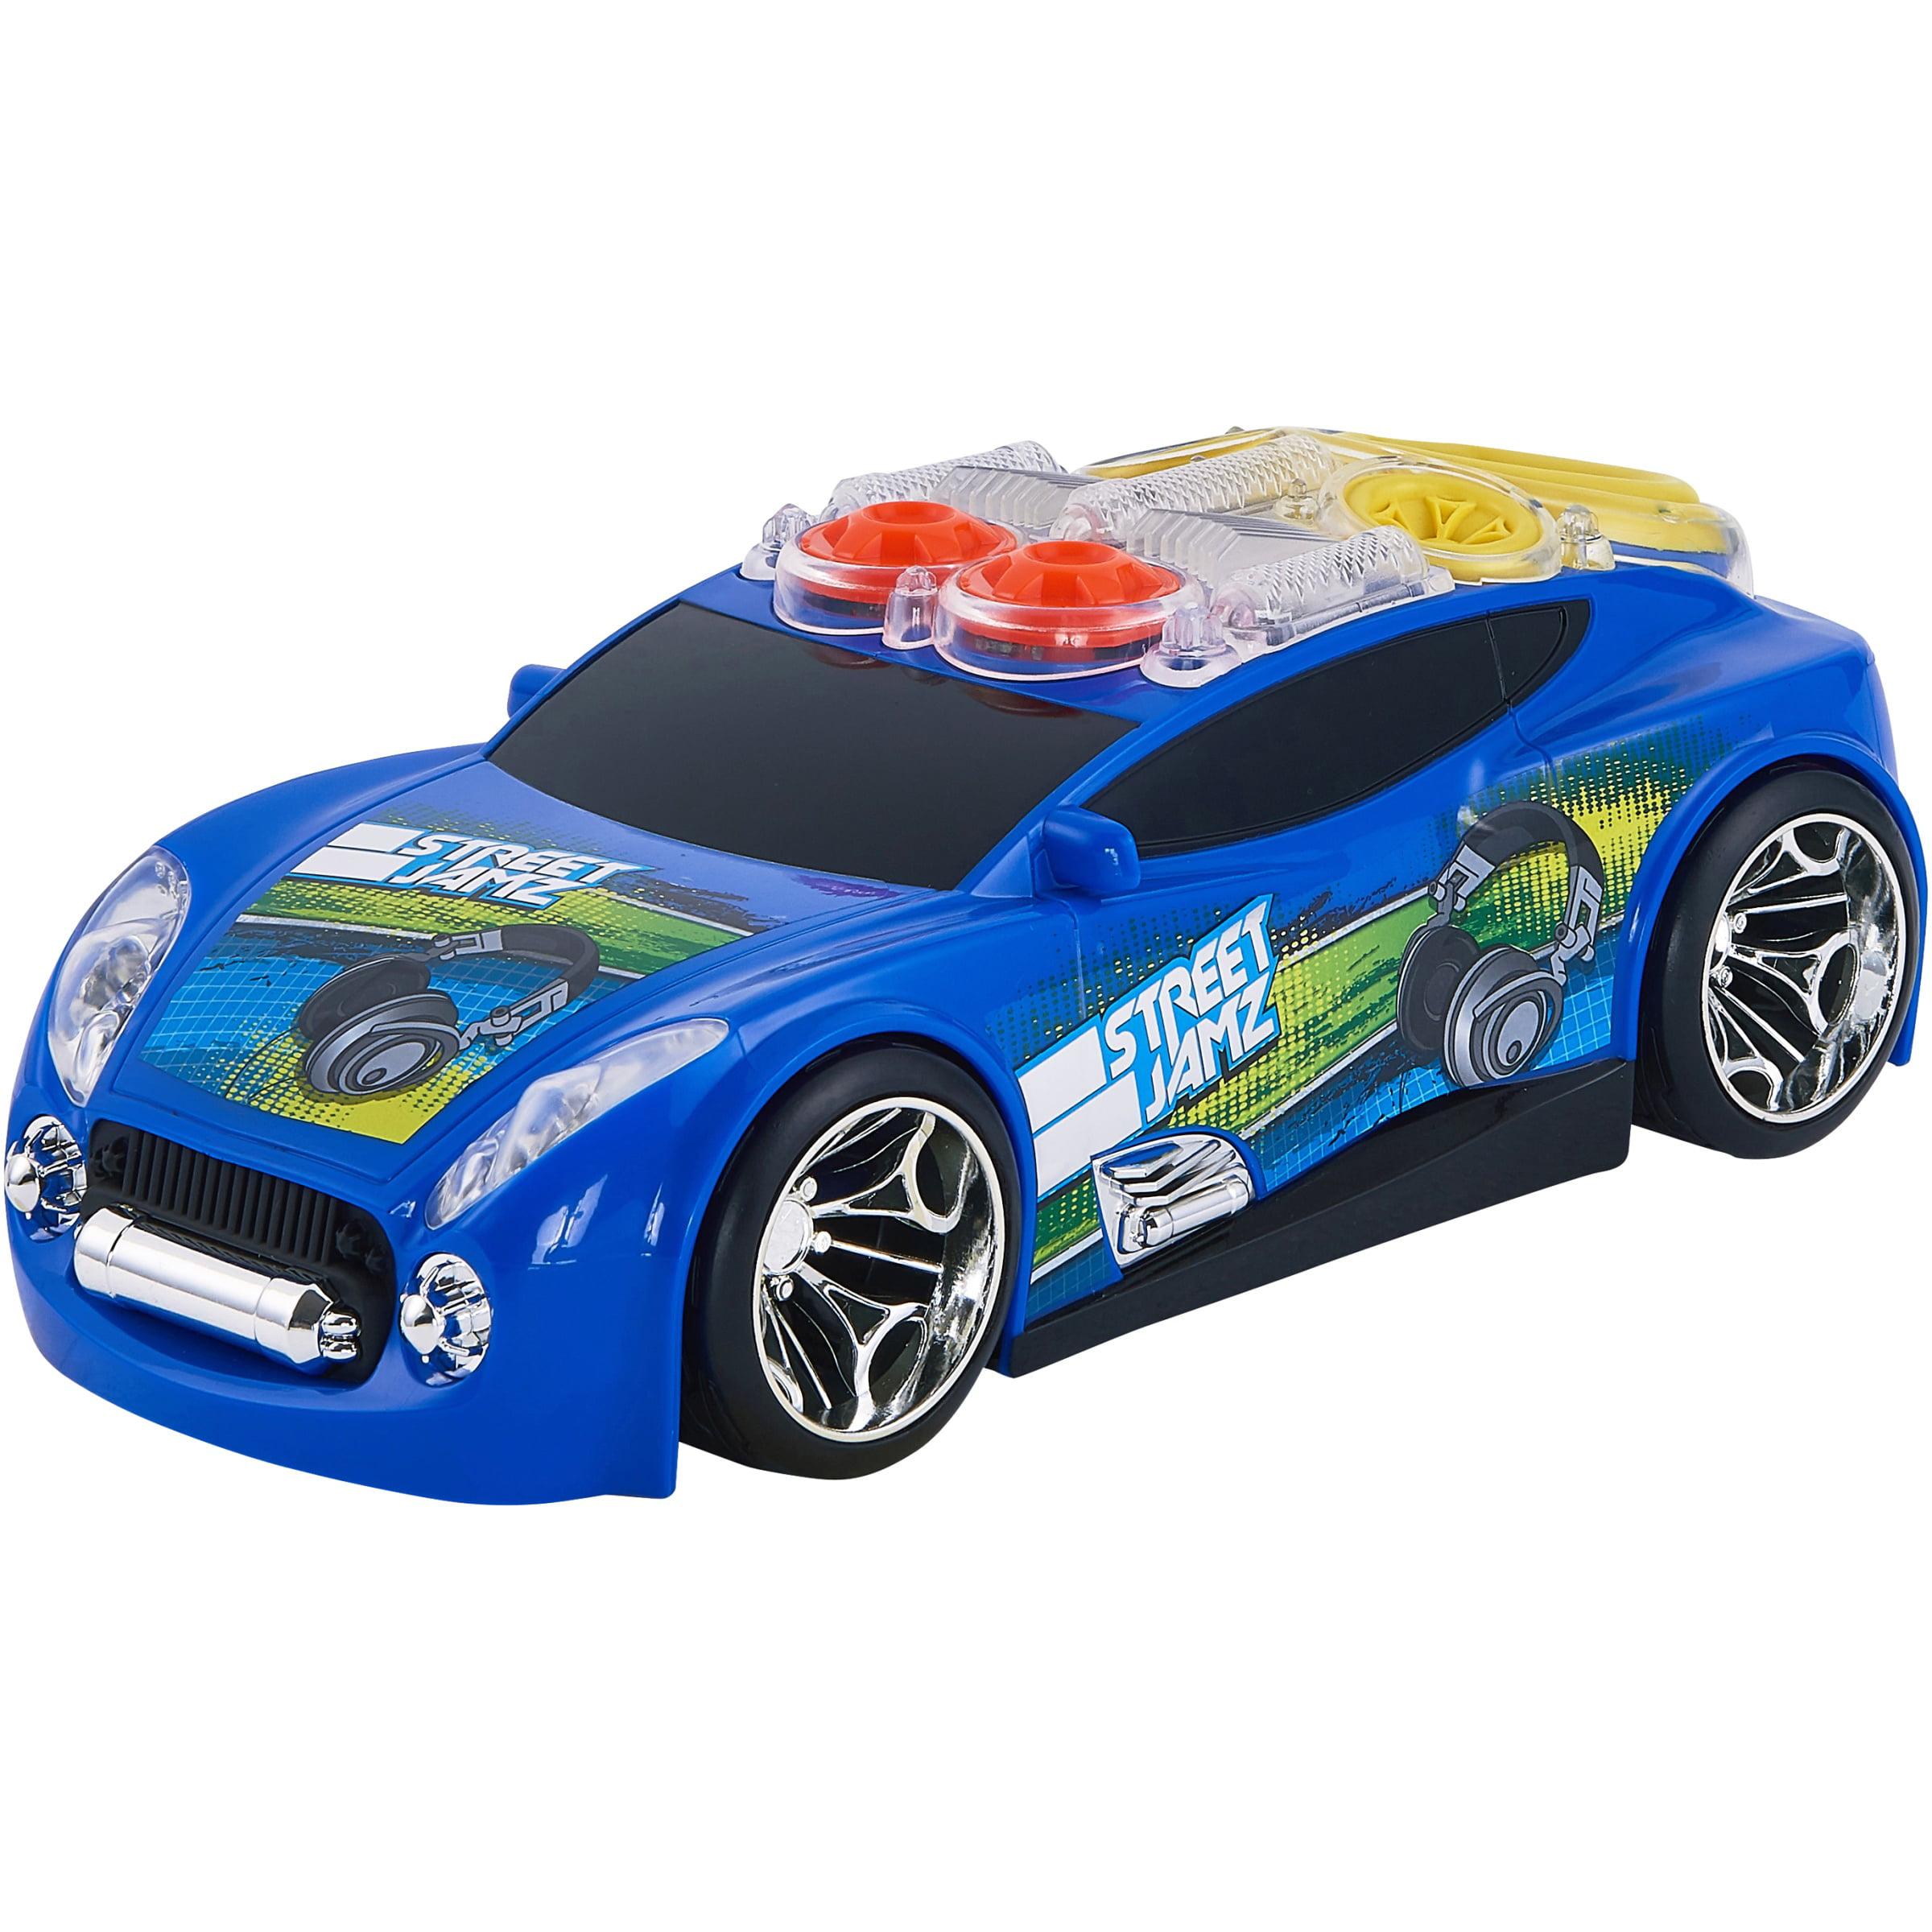 Adventure Force Lights & Sound Street Jamz Motorized Vehicle, Blue